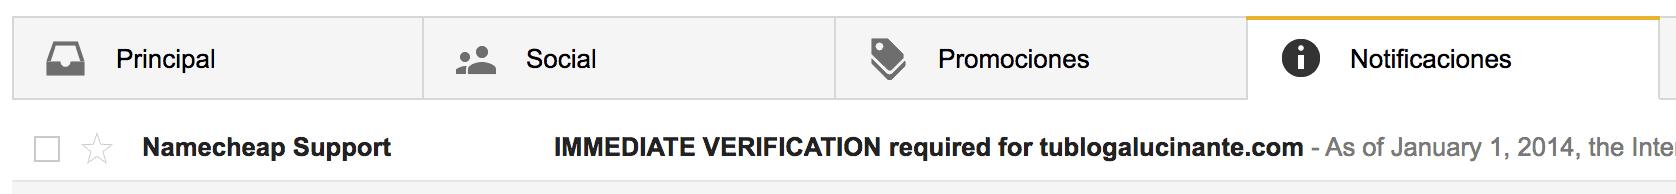 email confirmacion